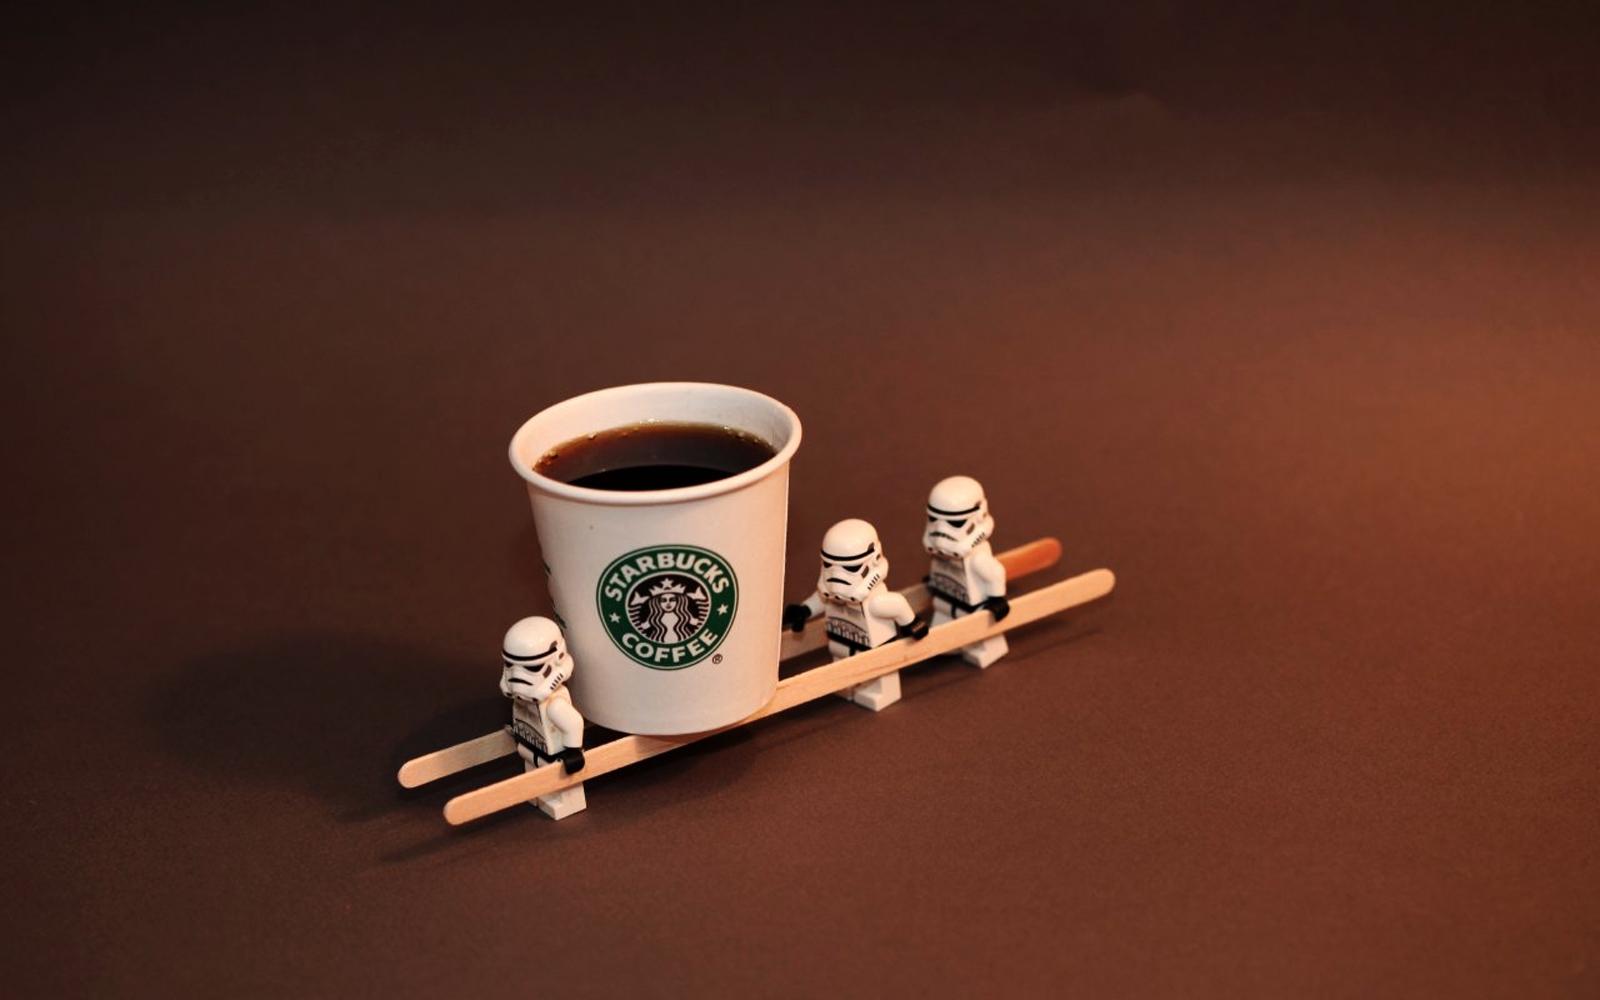 Starbucks Coffee Logo HD Wallpapers: HD Wallpapers ...